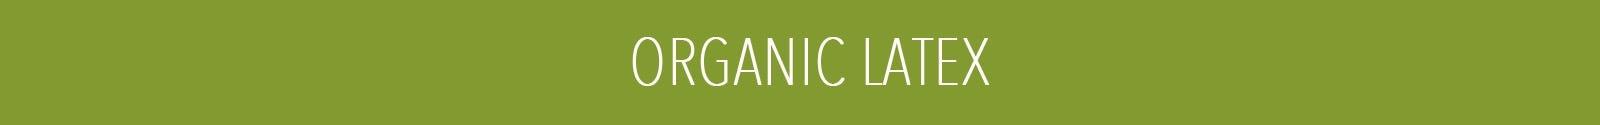 Organic Latex